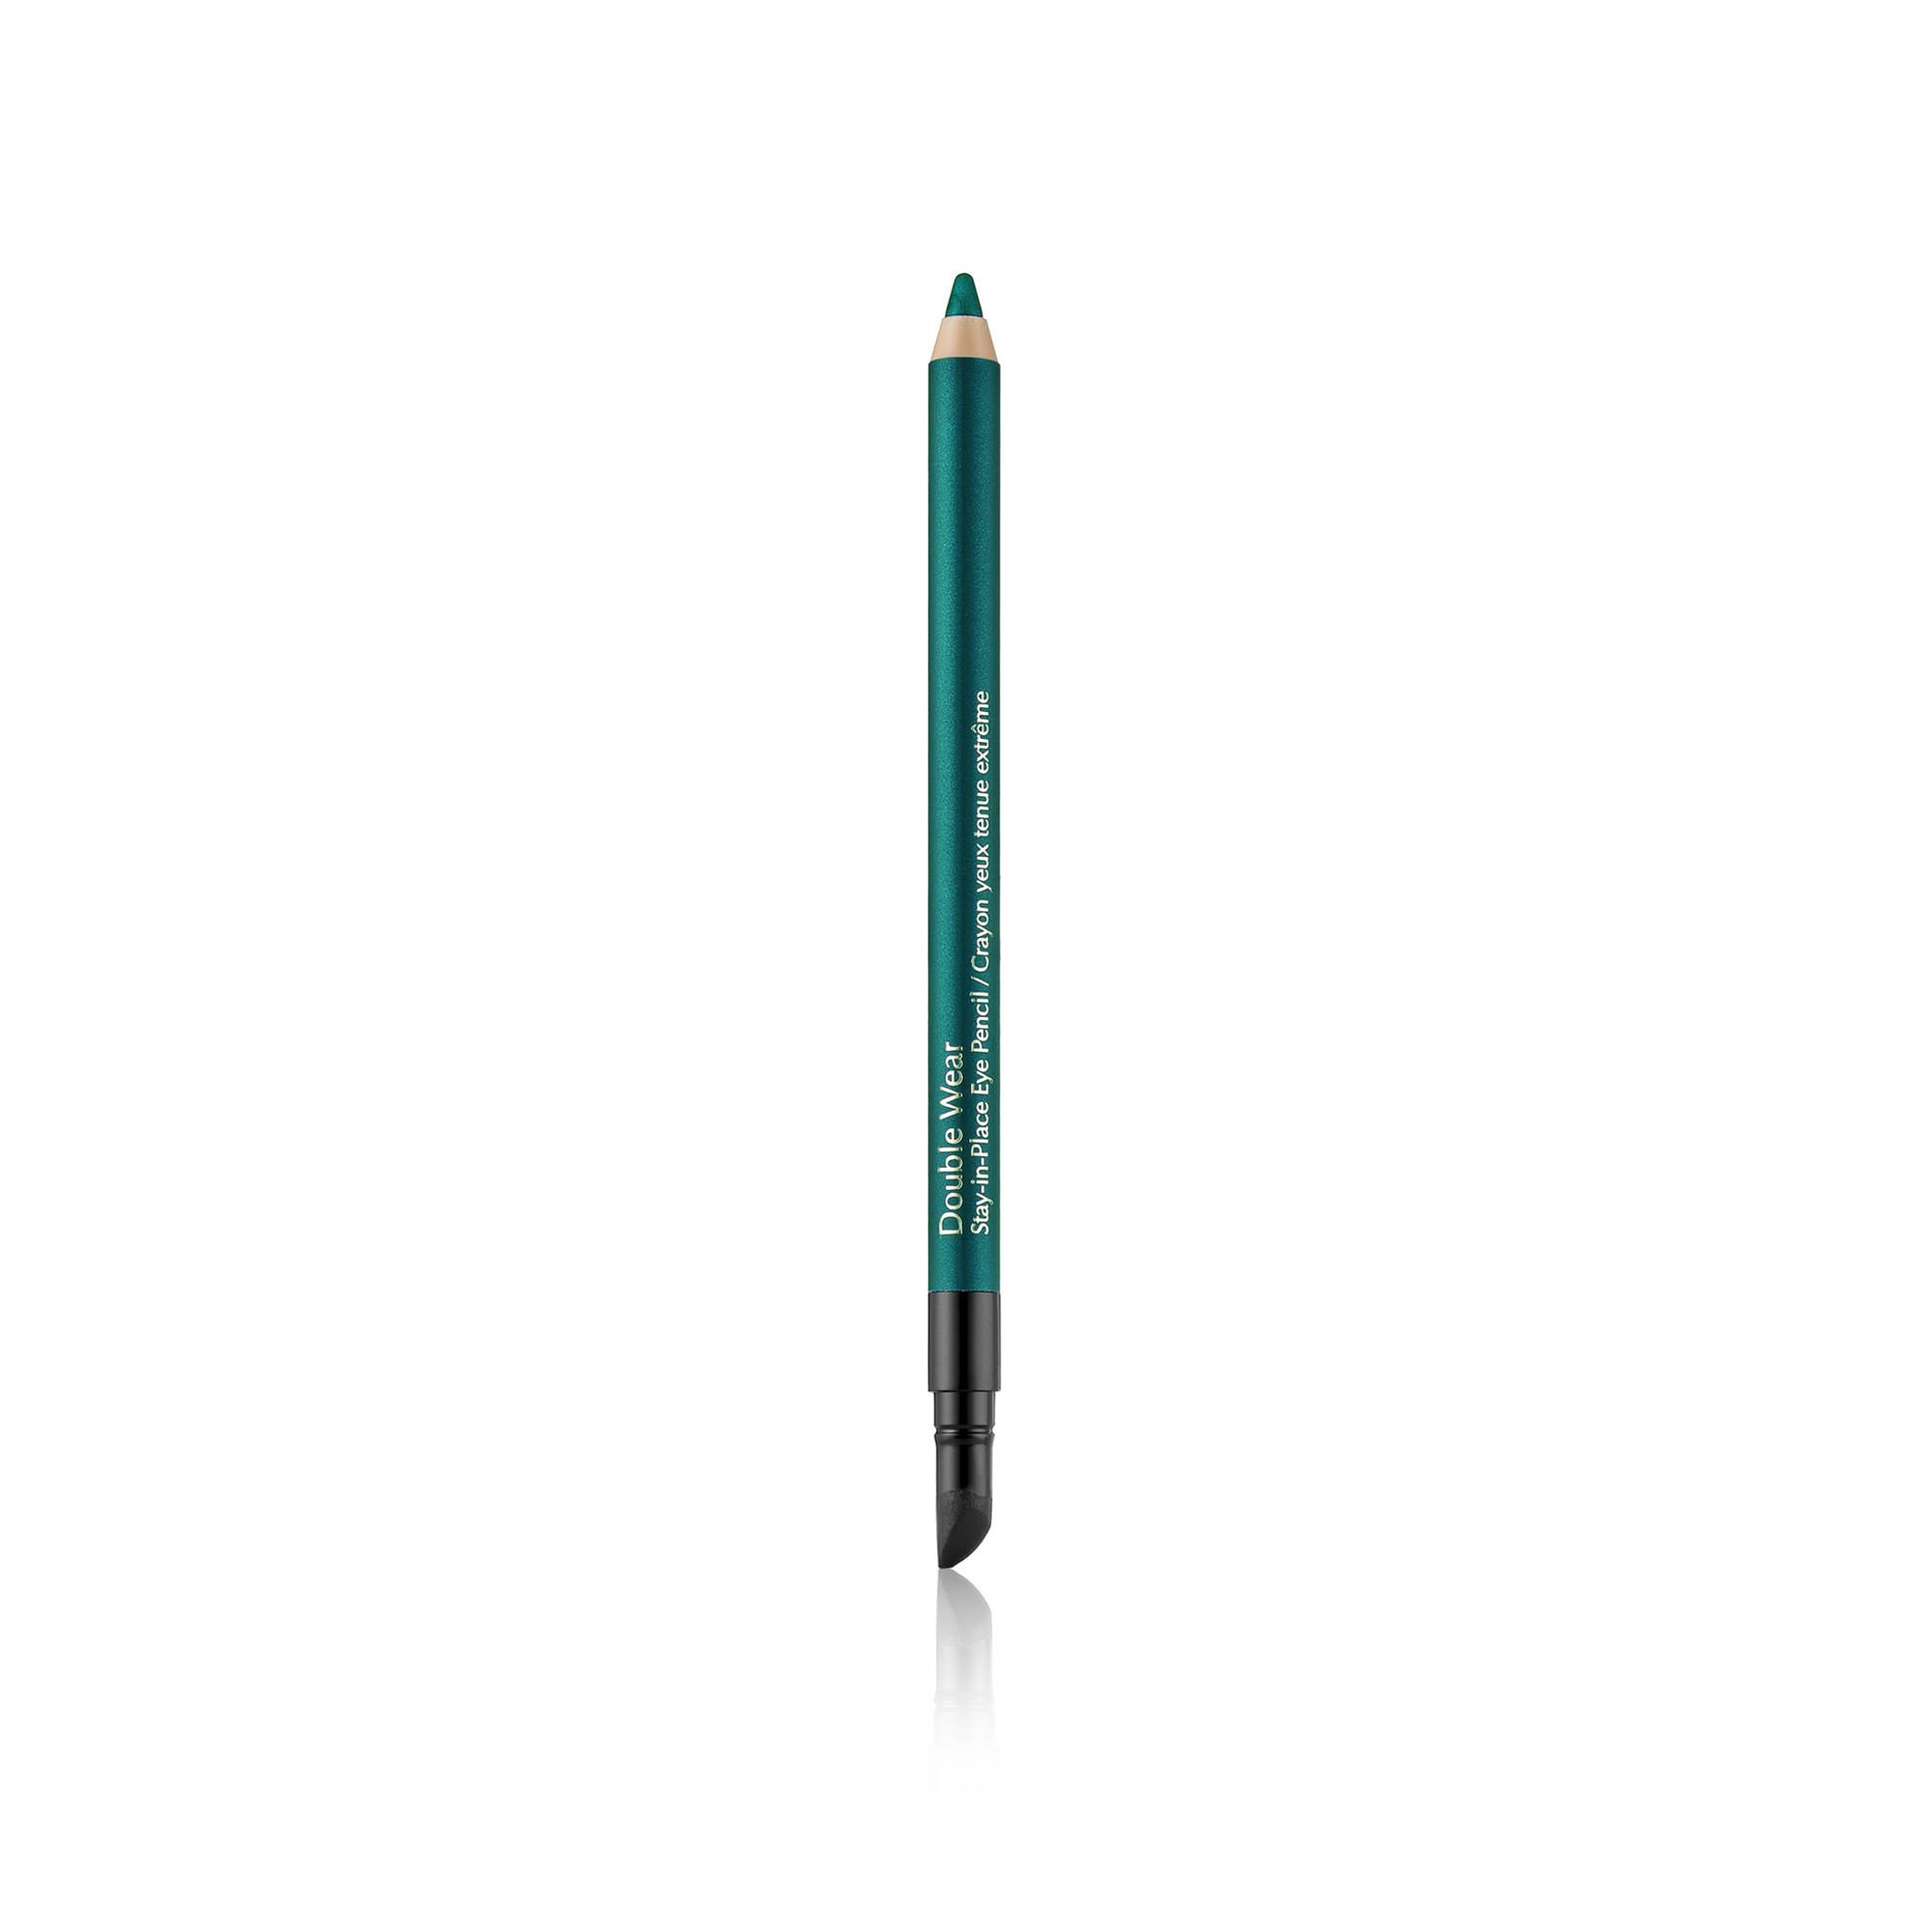 Estée Lauder double wear stay-in-place eye pencils  emerald volt 1,2 g, EMERALD VOLT, large image number 0